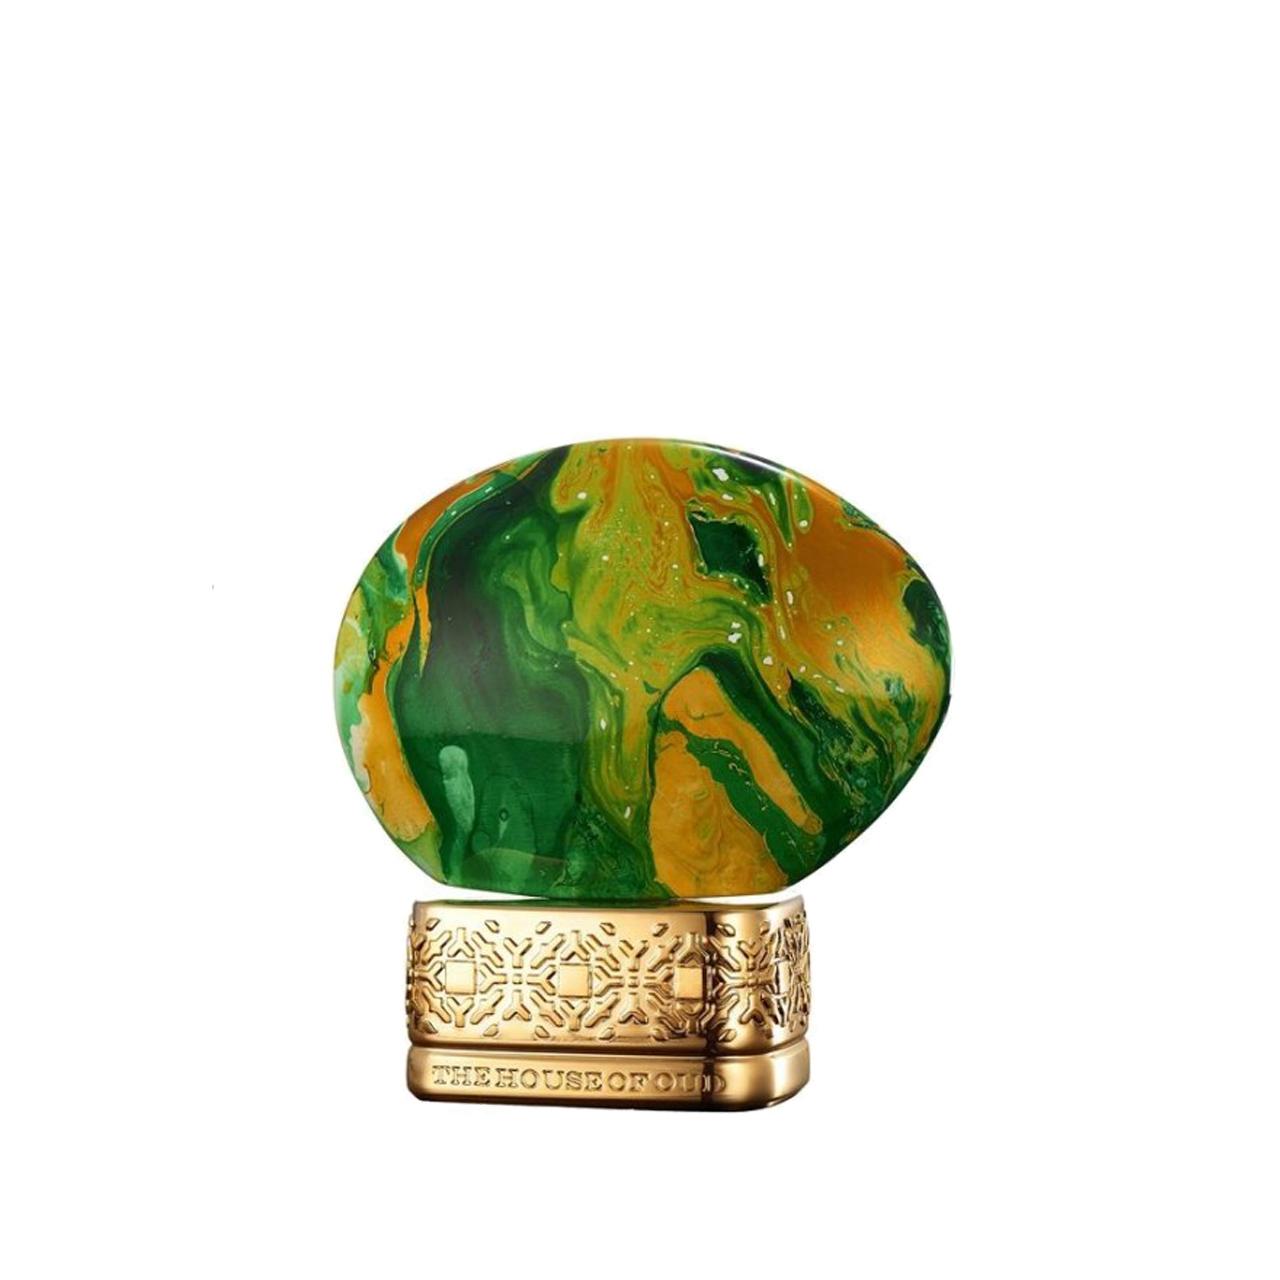 Cypress Shade - Eau de Parfum